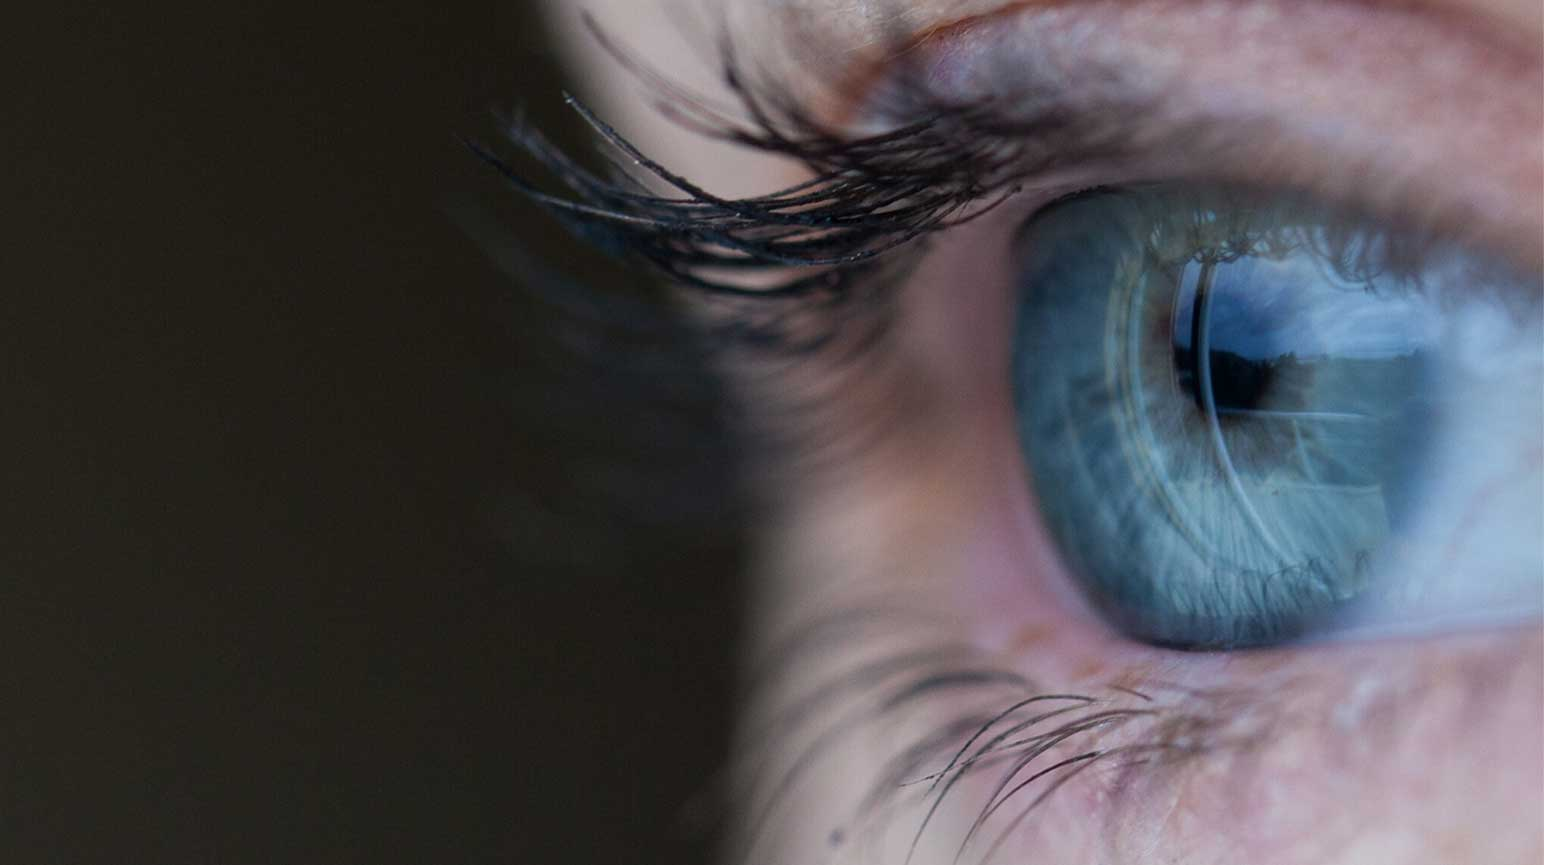 How We Lose Vision